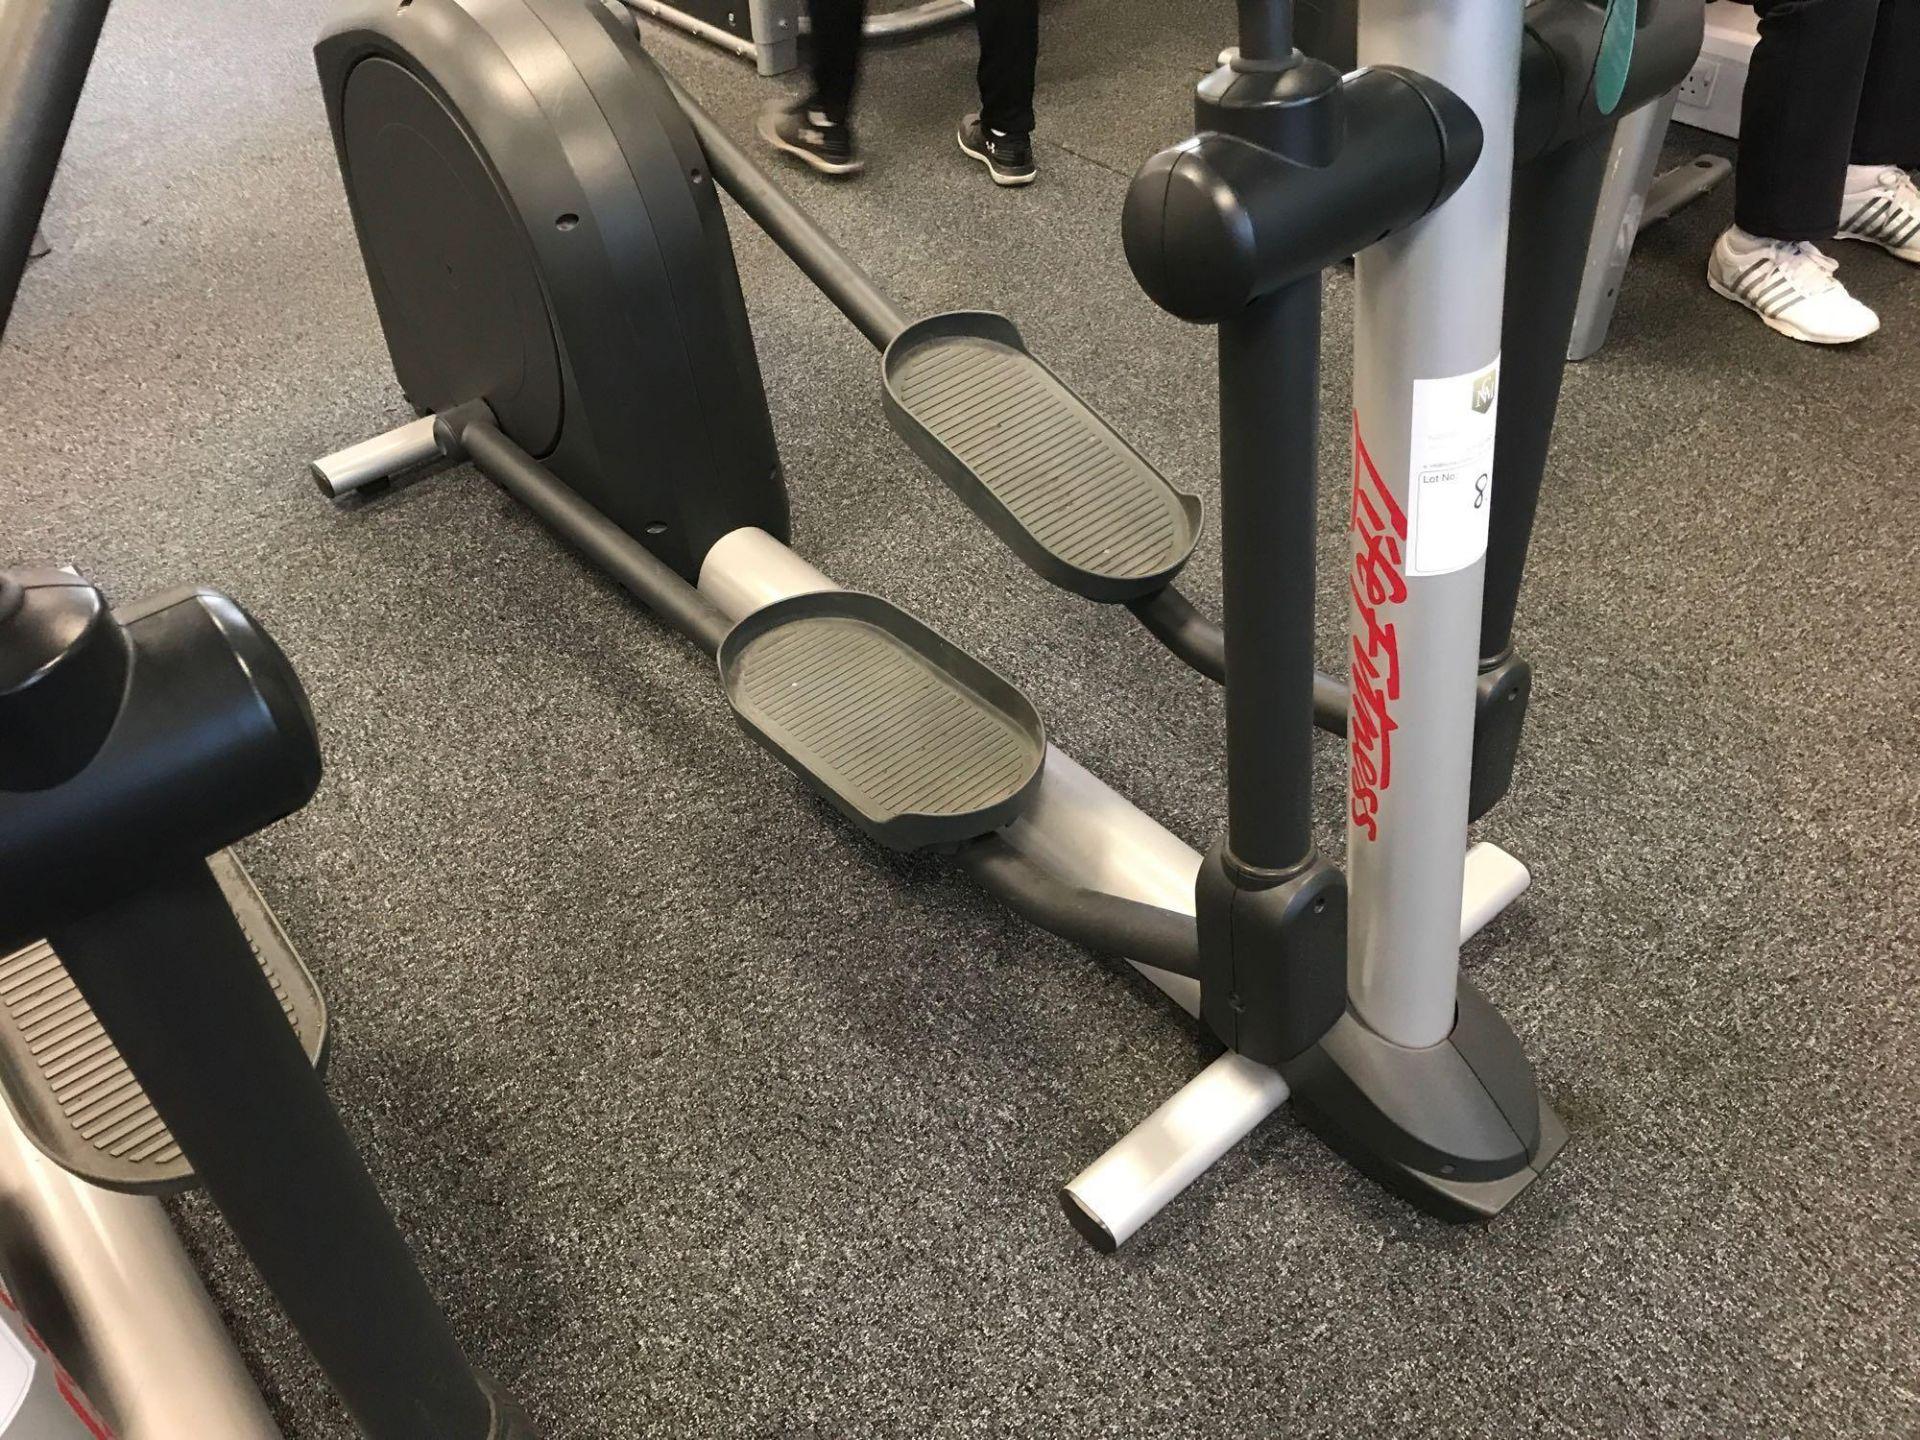 Lot 8 - x1 Life fitness Cross trainer